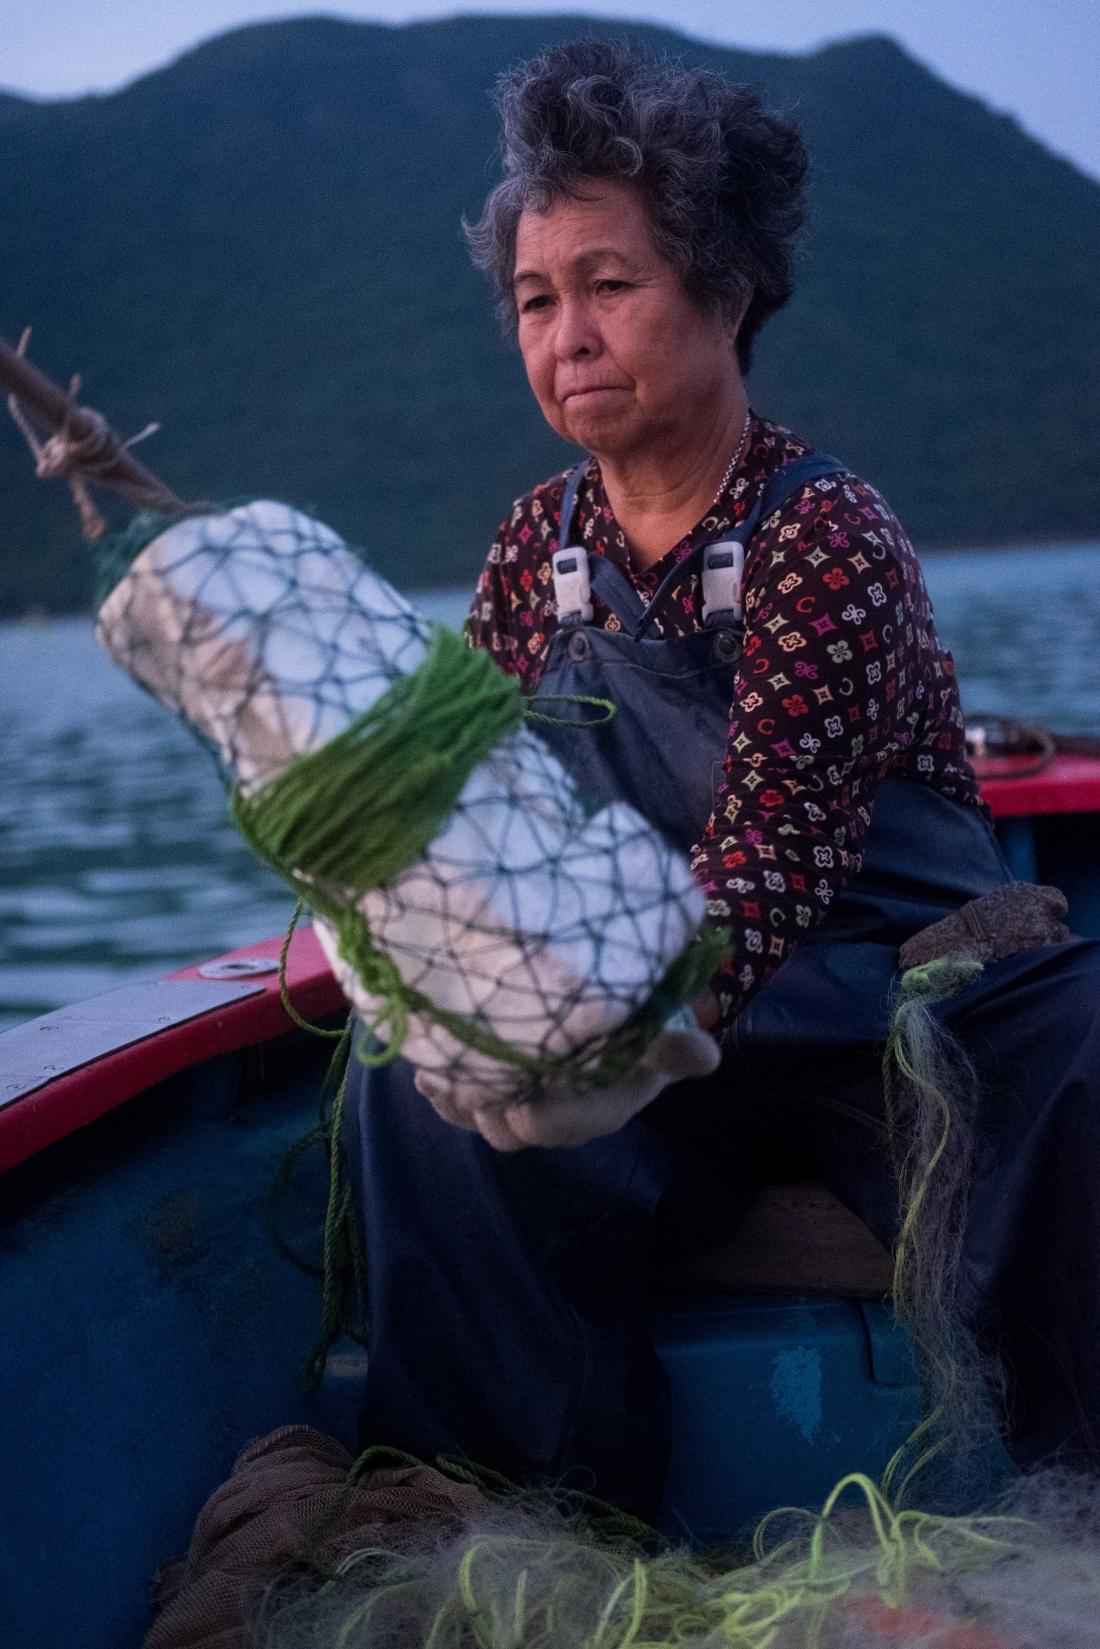 Image - Tai O Light - Fishinglady - Studio Florian Christine